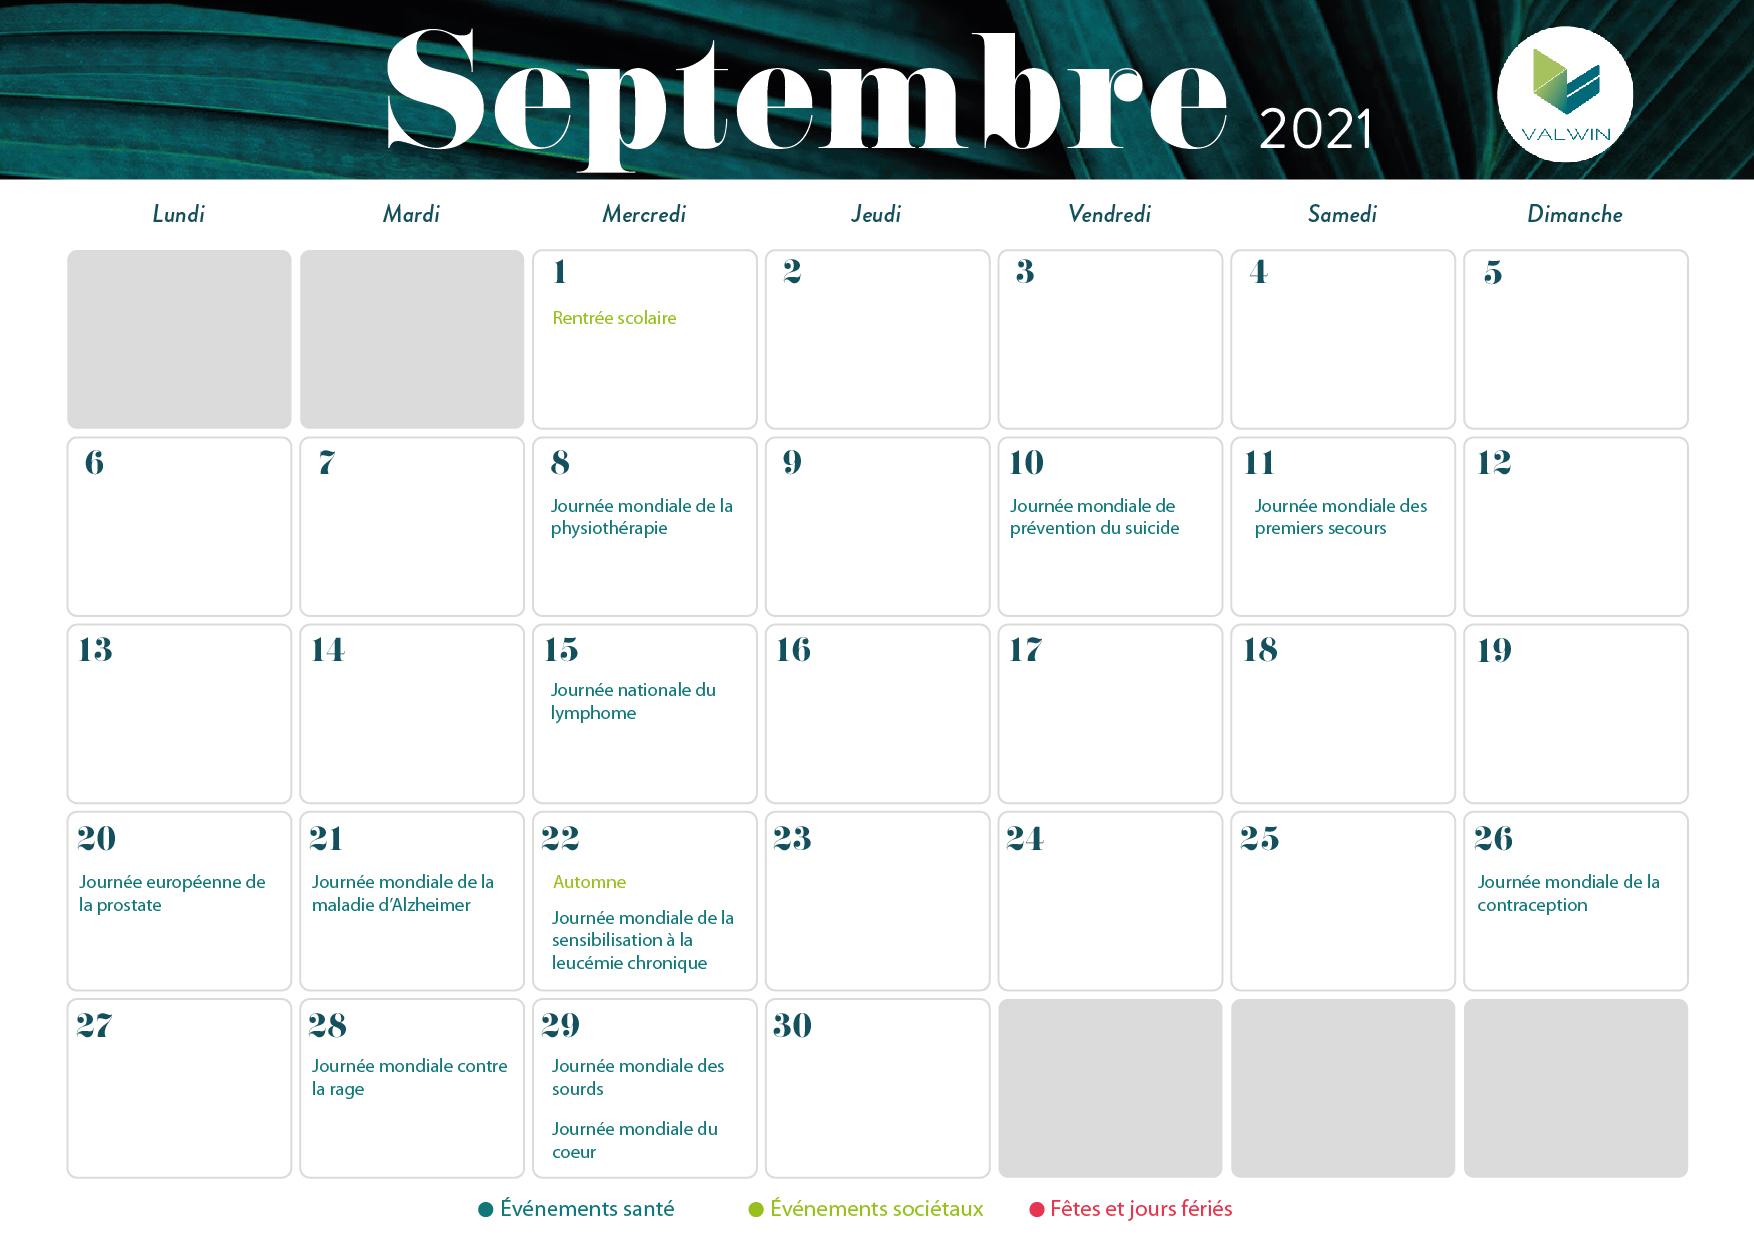 Septembre-calendrier-journee-mondiale-sante-2021.jpg